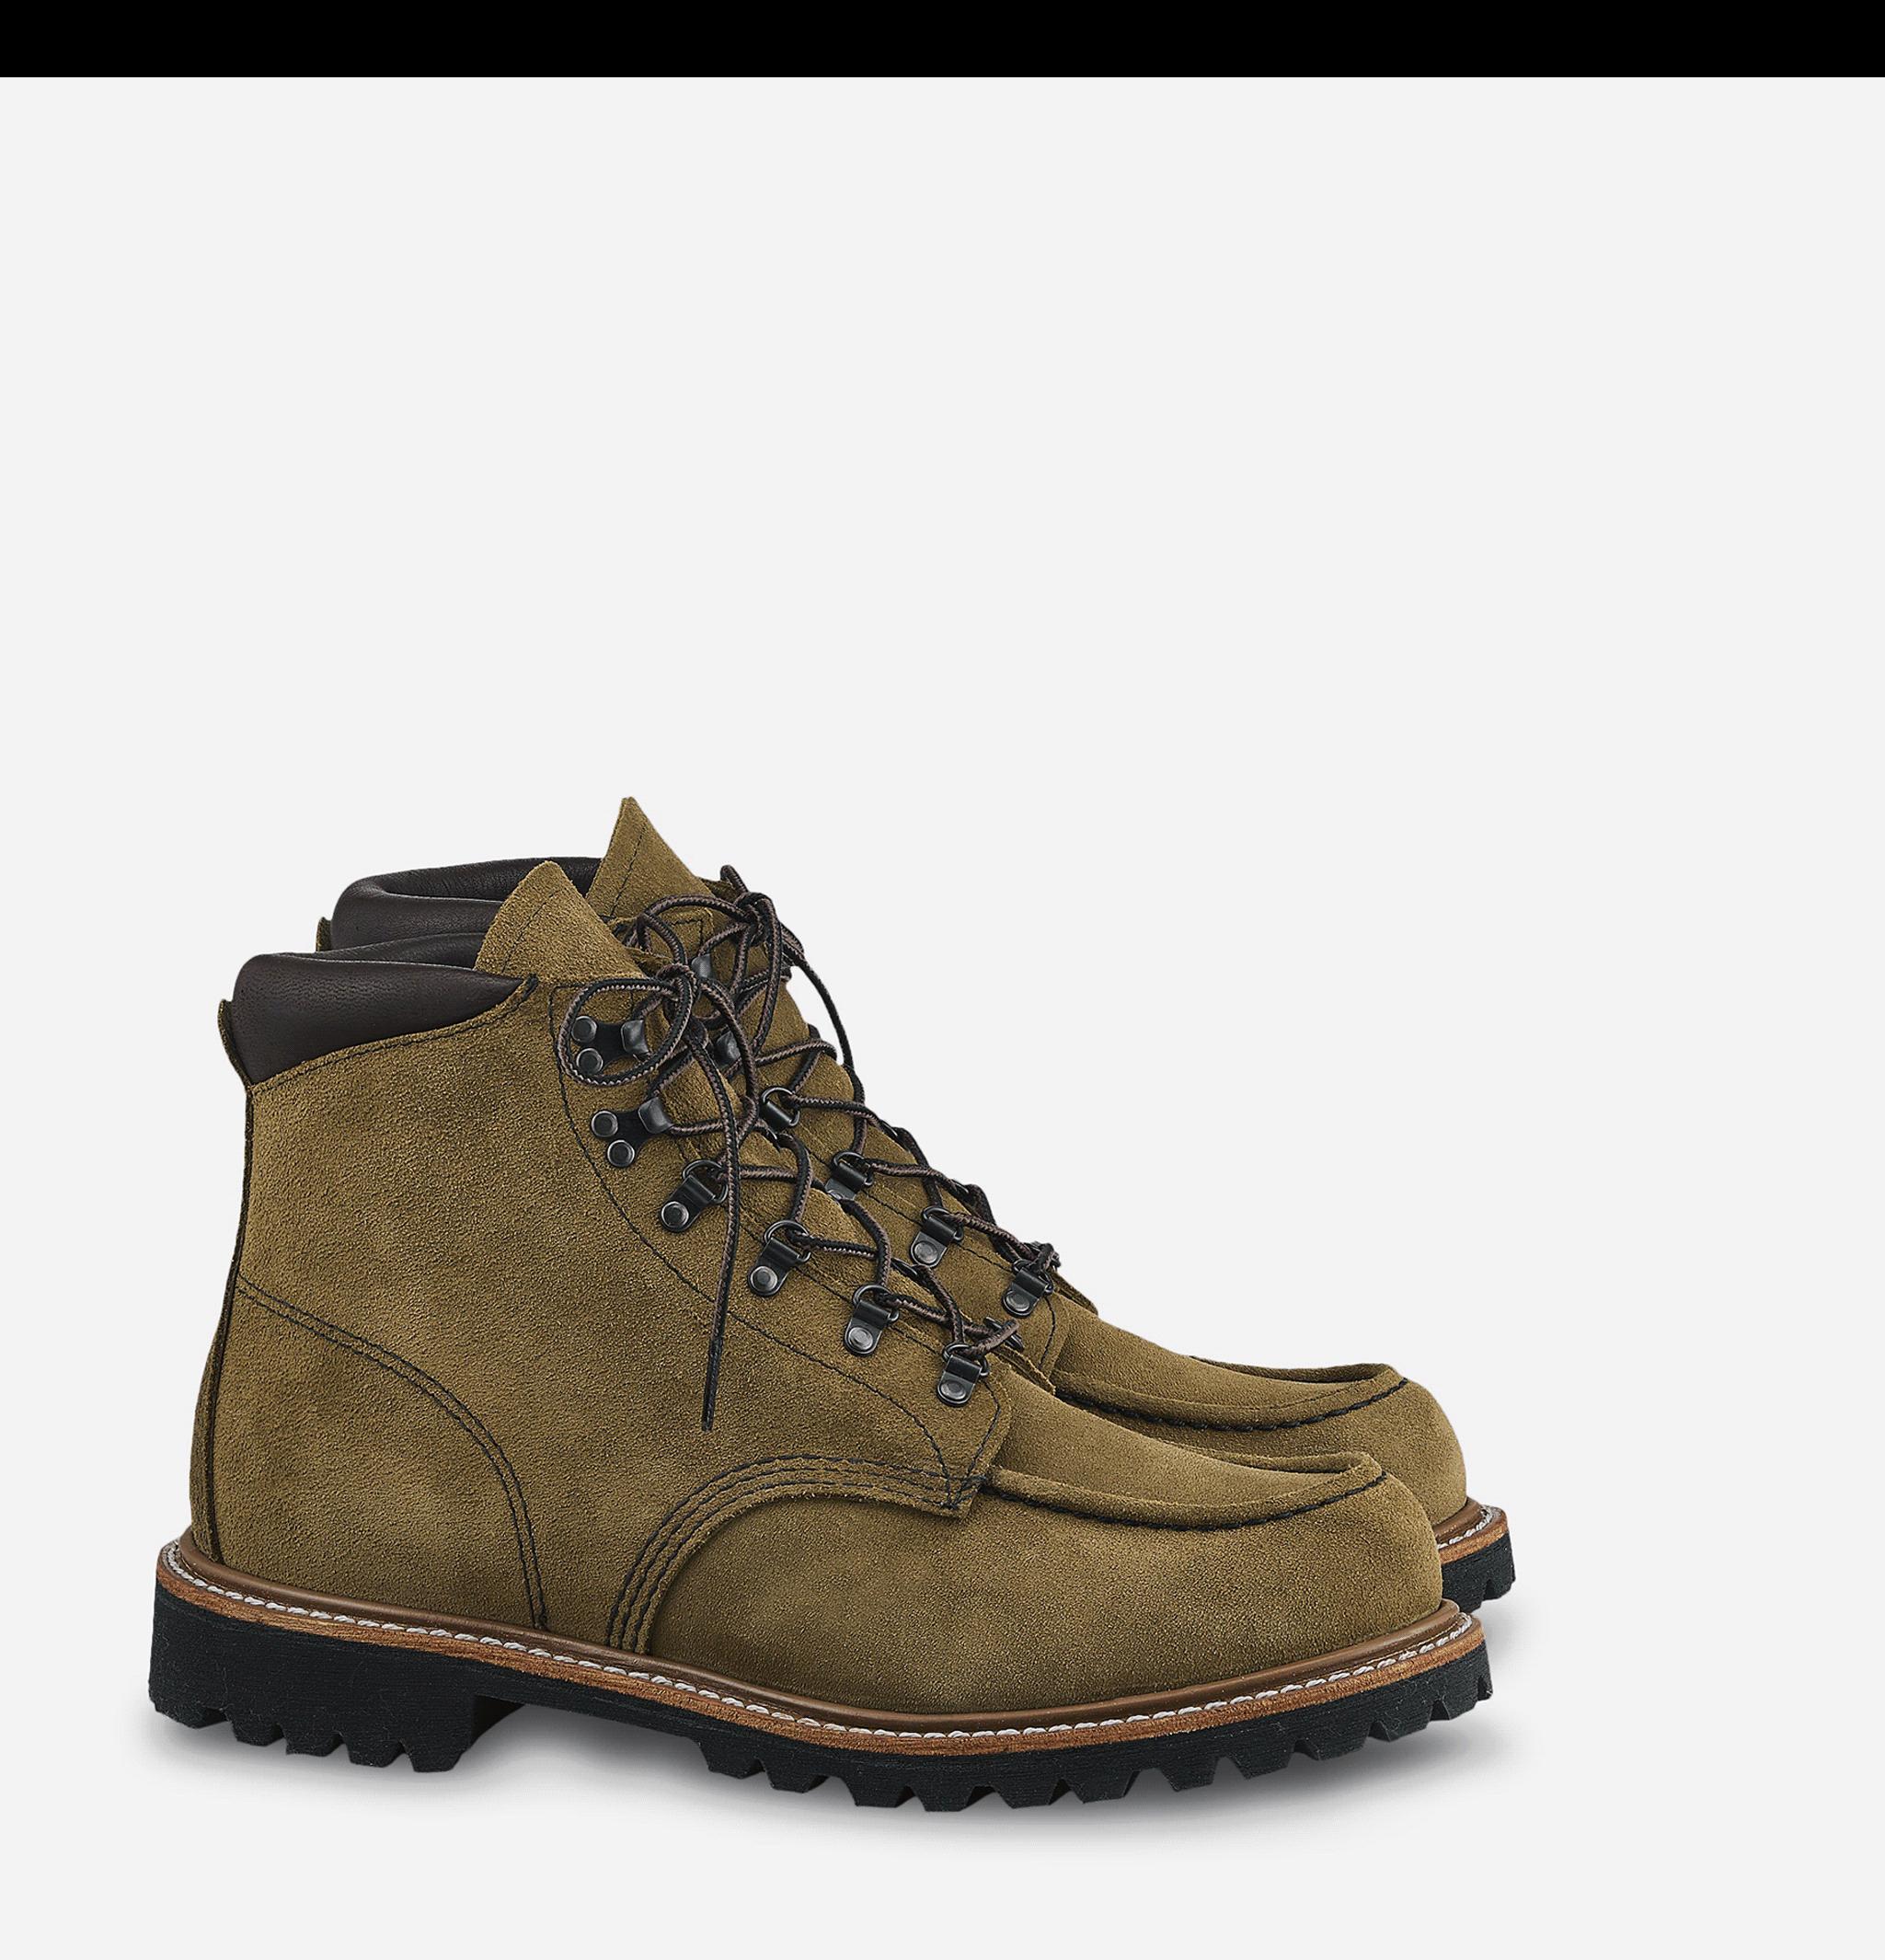 2926 - Sawmill Boot Olive